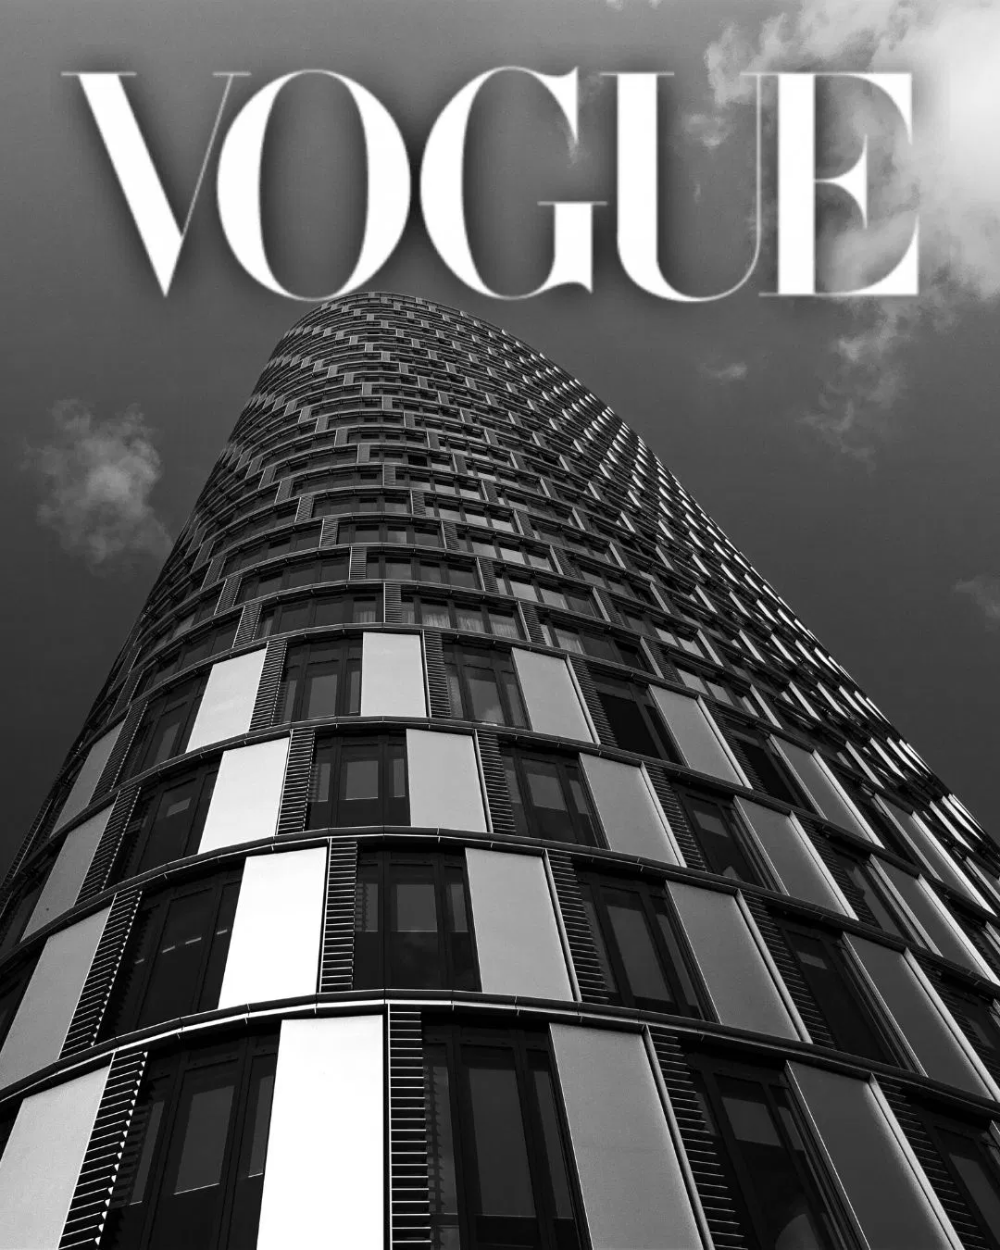 15 Best Vogue Challenge Templates Backgrounds For Tiktok Instagram Background Instagram White Edit My Photo